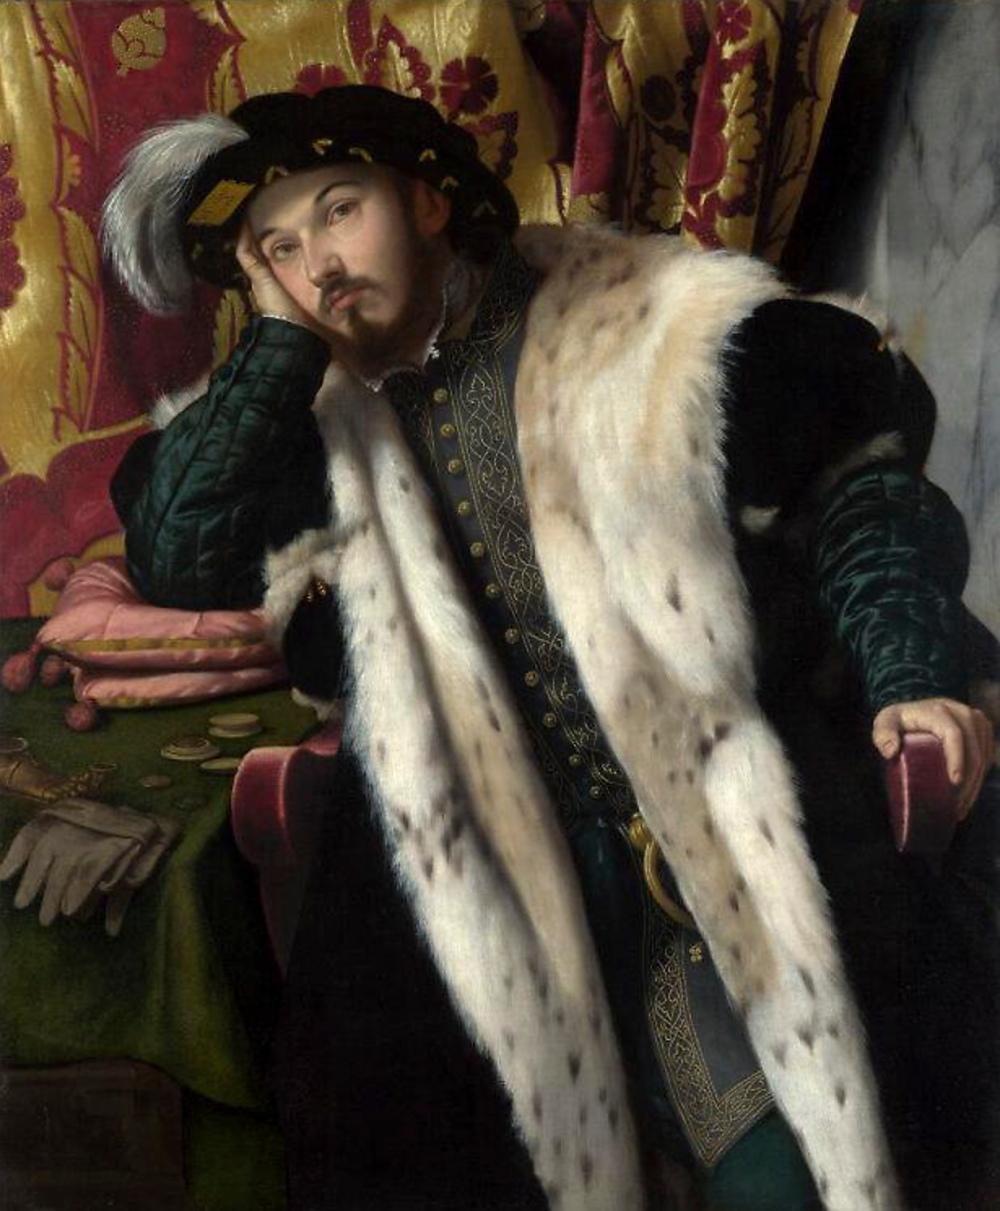 Moretto da Brescia. Retrato de un hombre joven. 1540-1545. National Gallery. Londres.